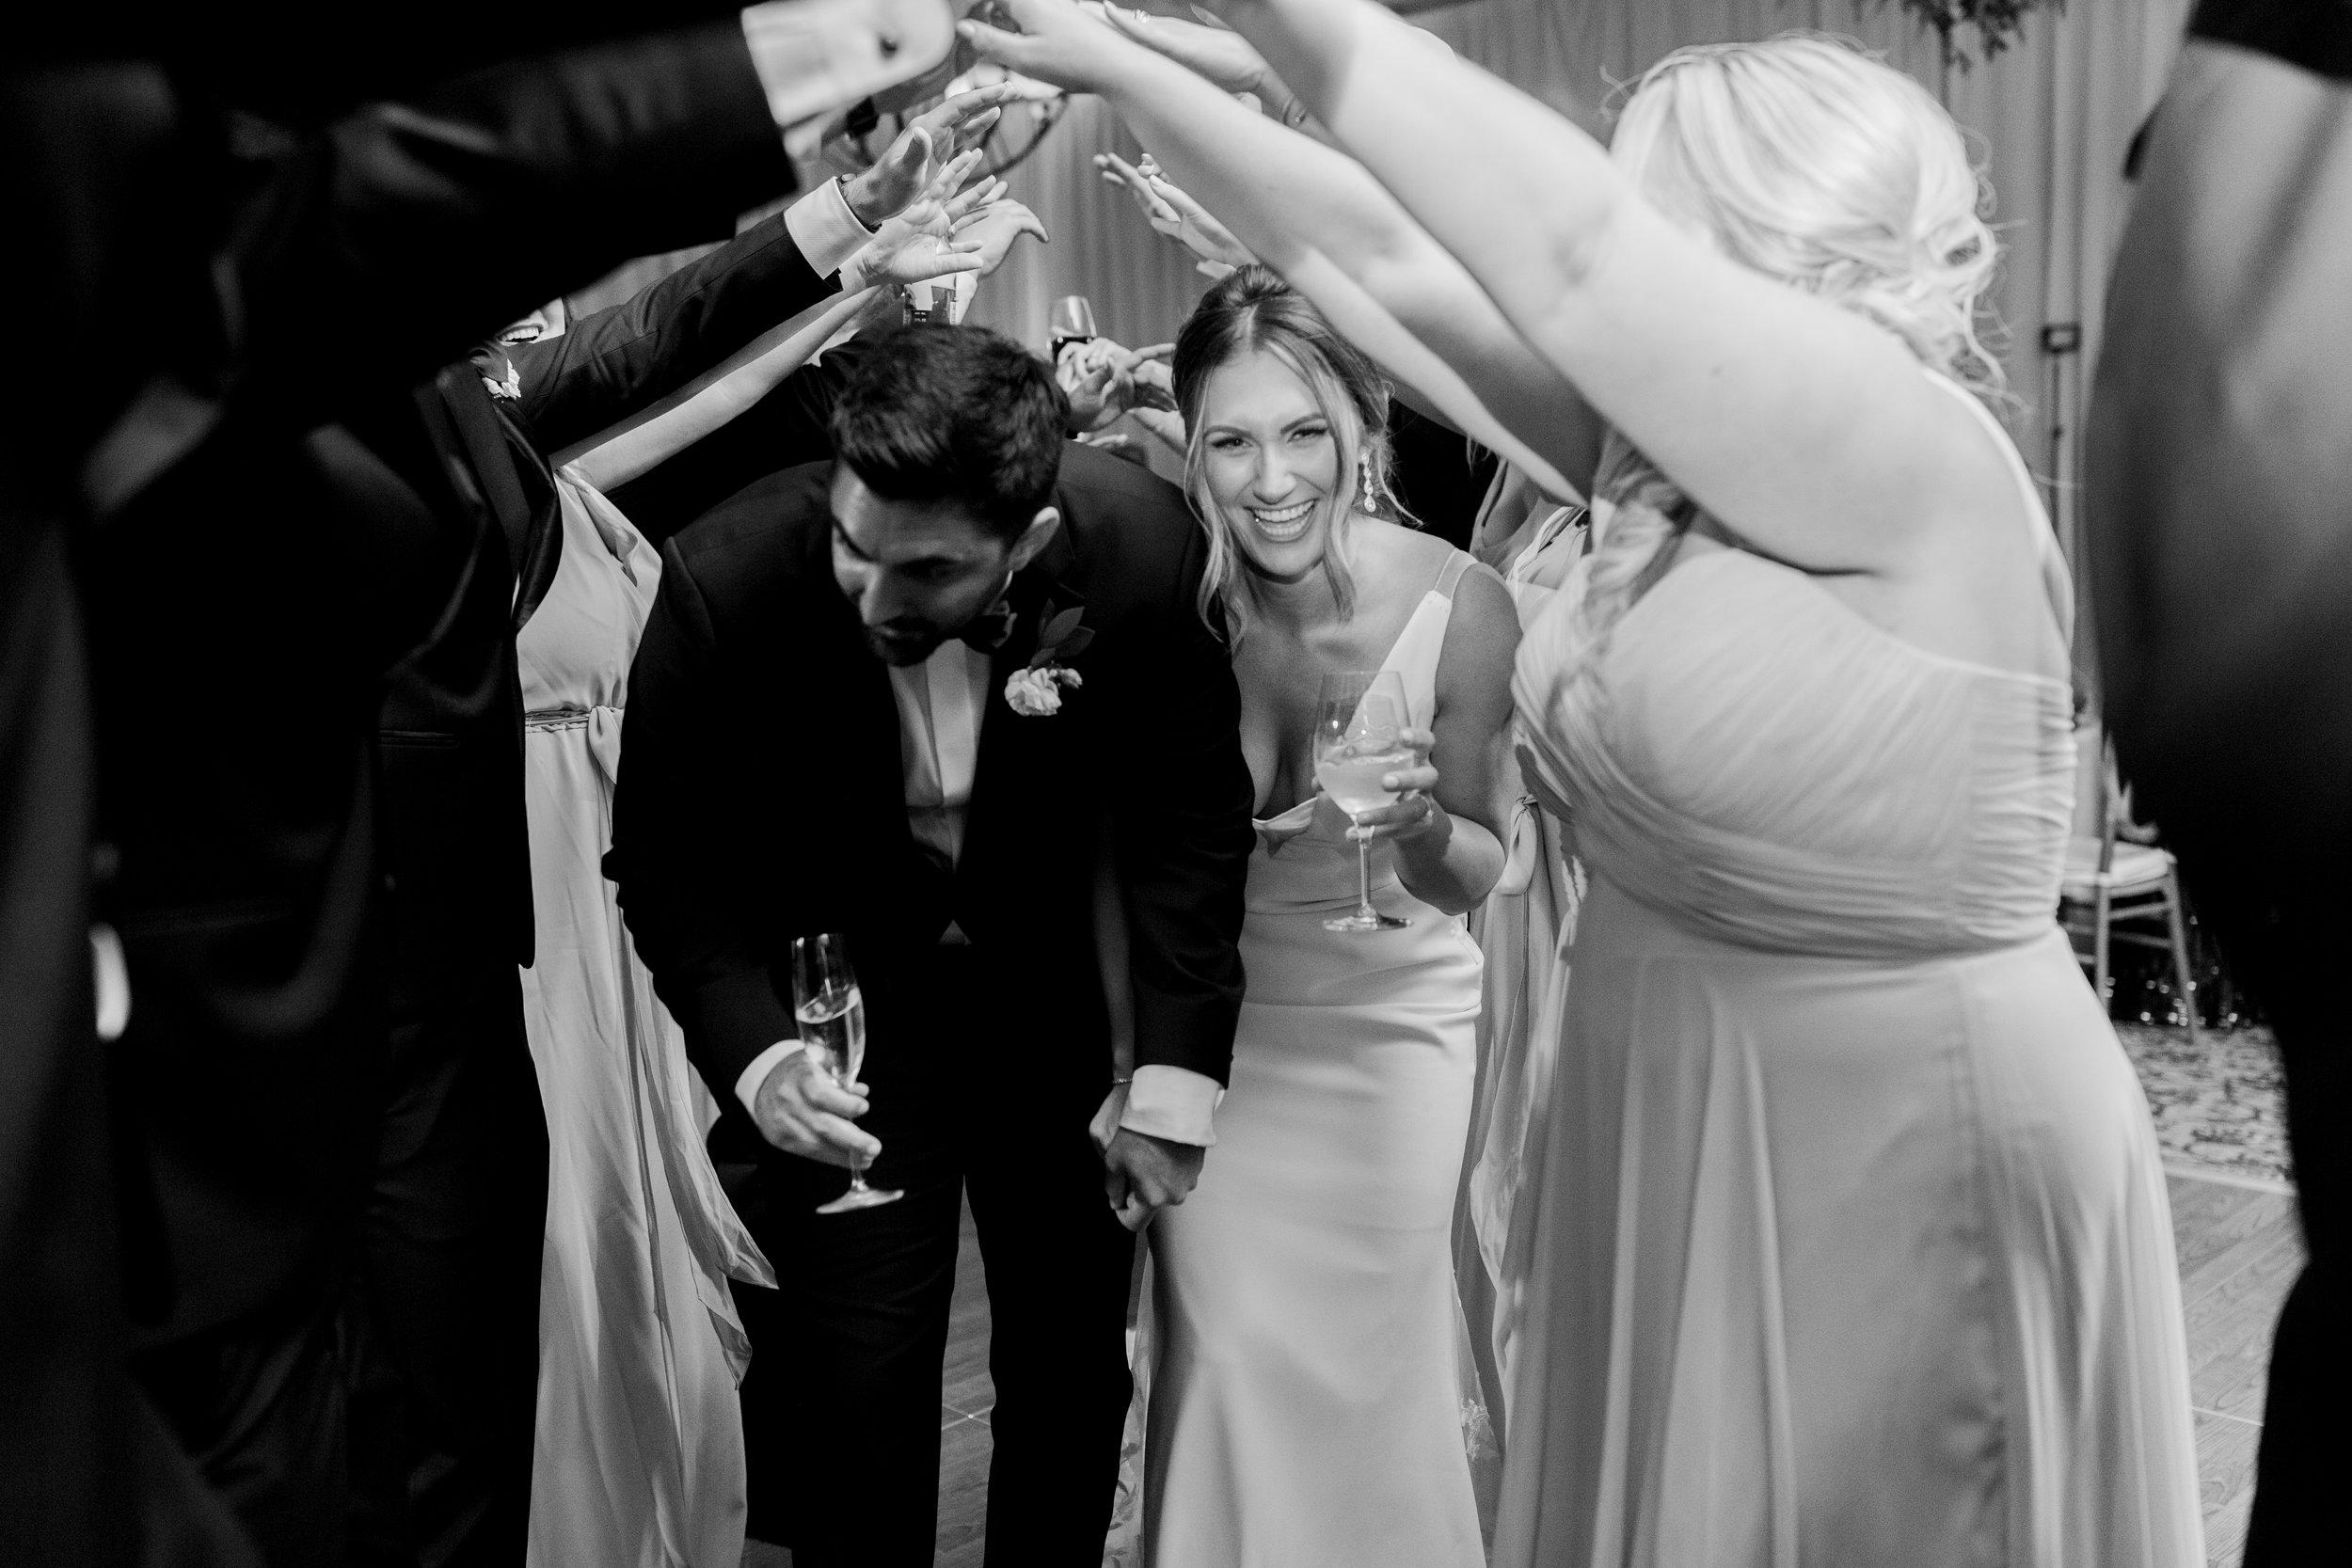 vintners-inn-wedding-in-santa-rosa-california-86.jpg